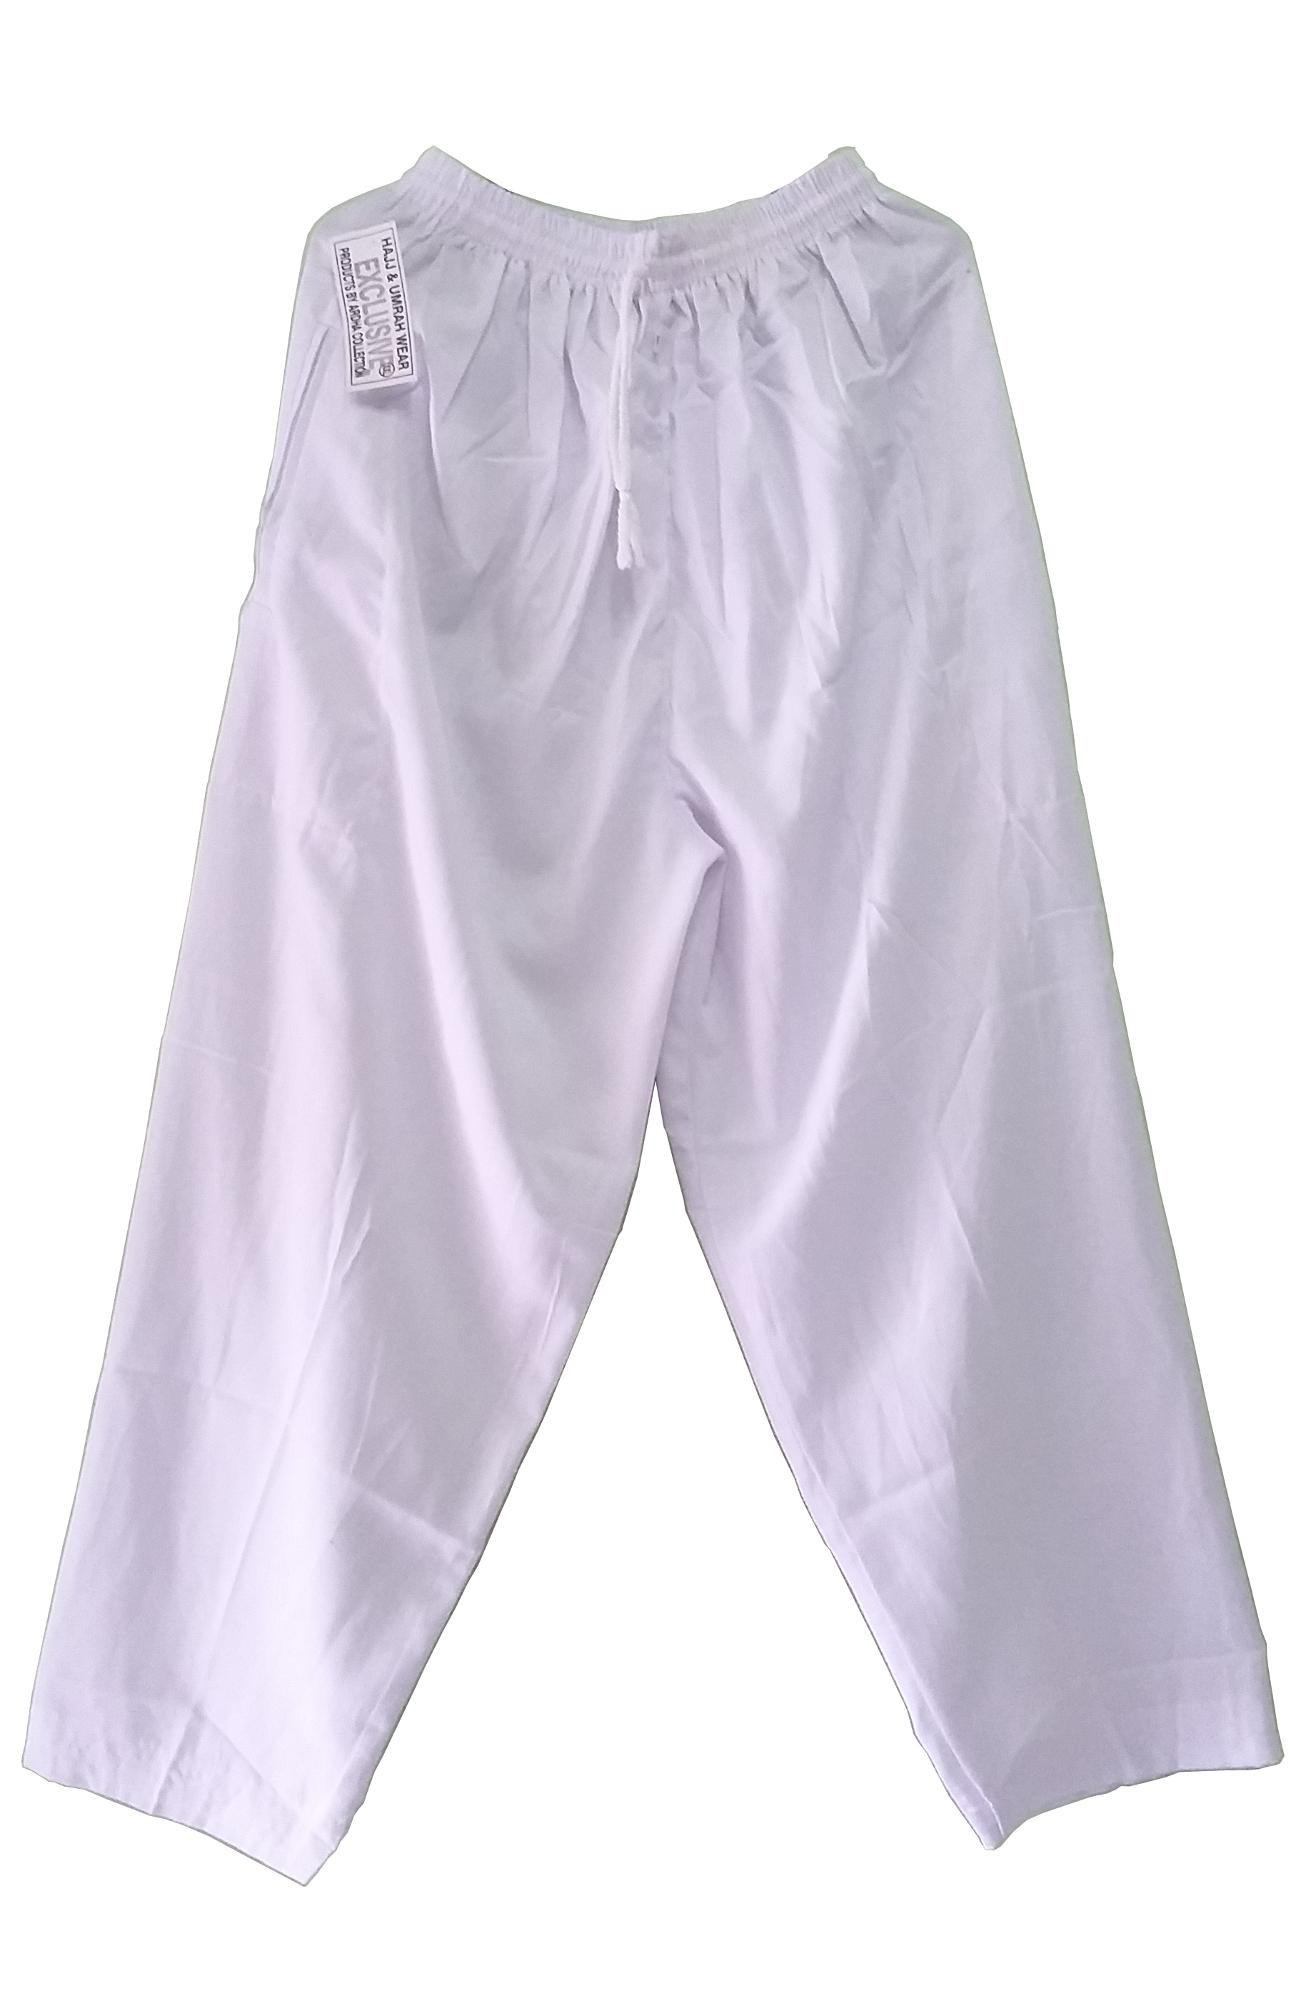 Beli Nabawi Celana Ihram Laki Laki Putih Baru